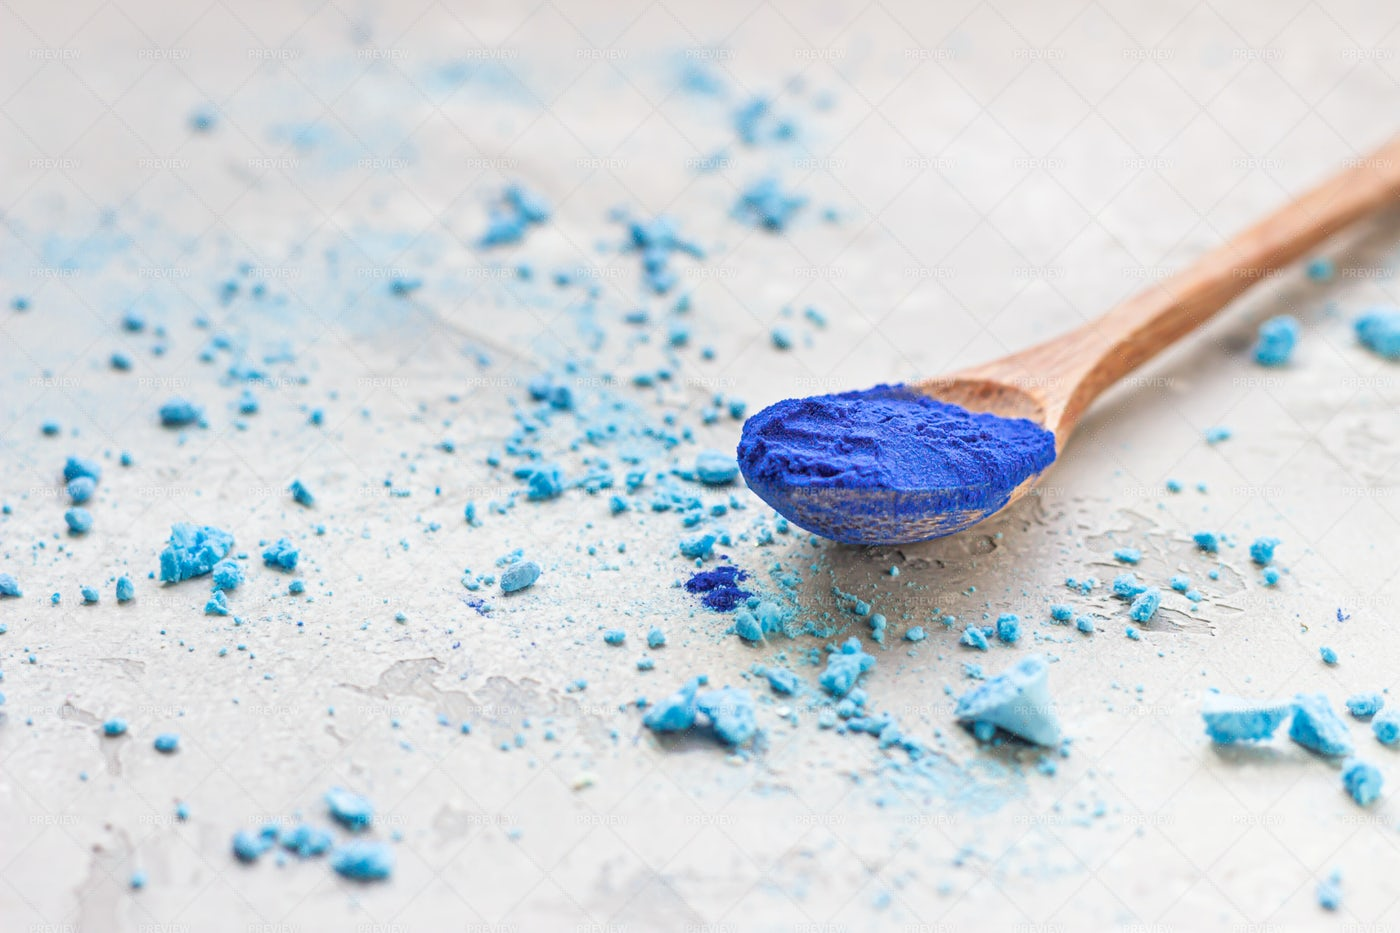 Blue Spirulina And Meringue: Stock Photos